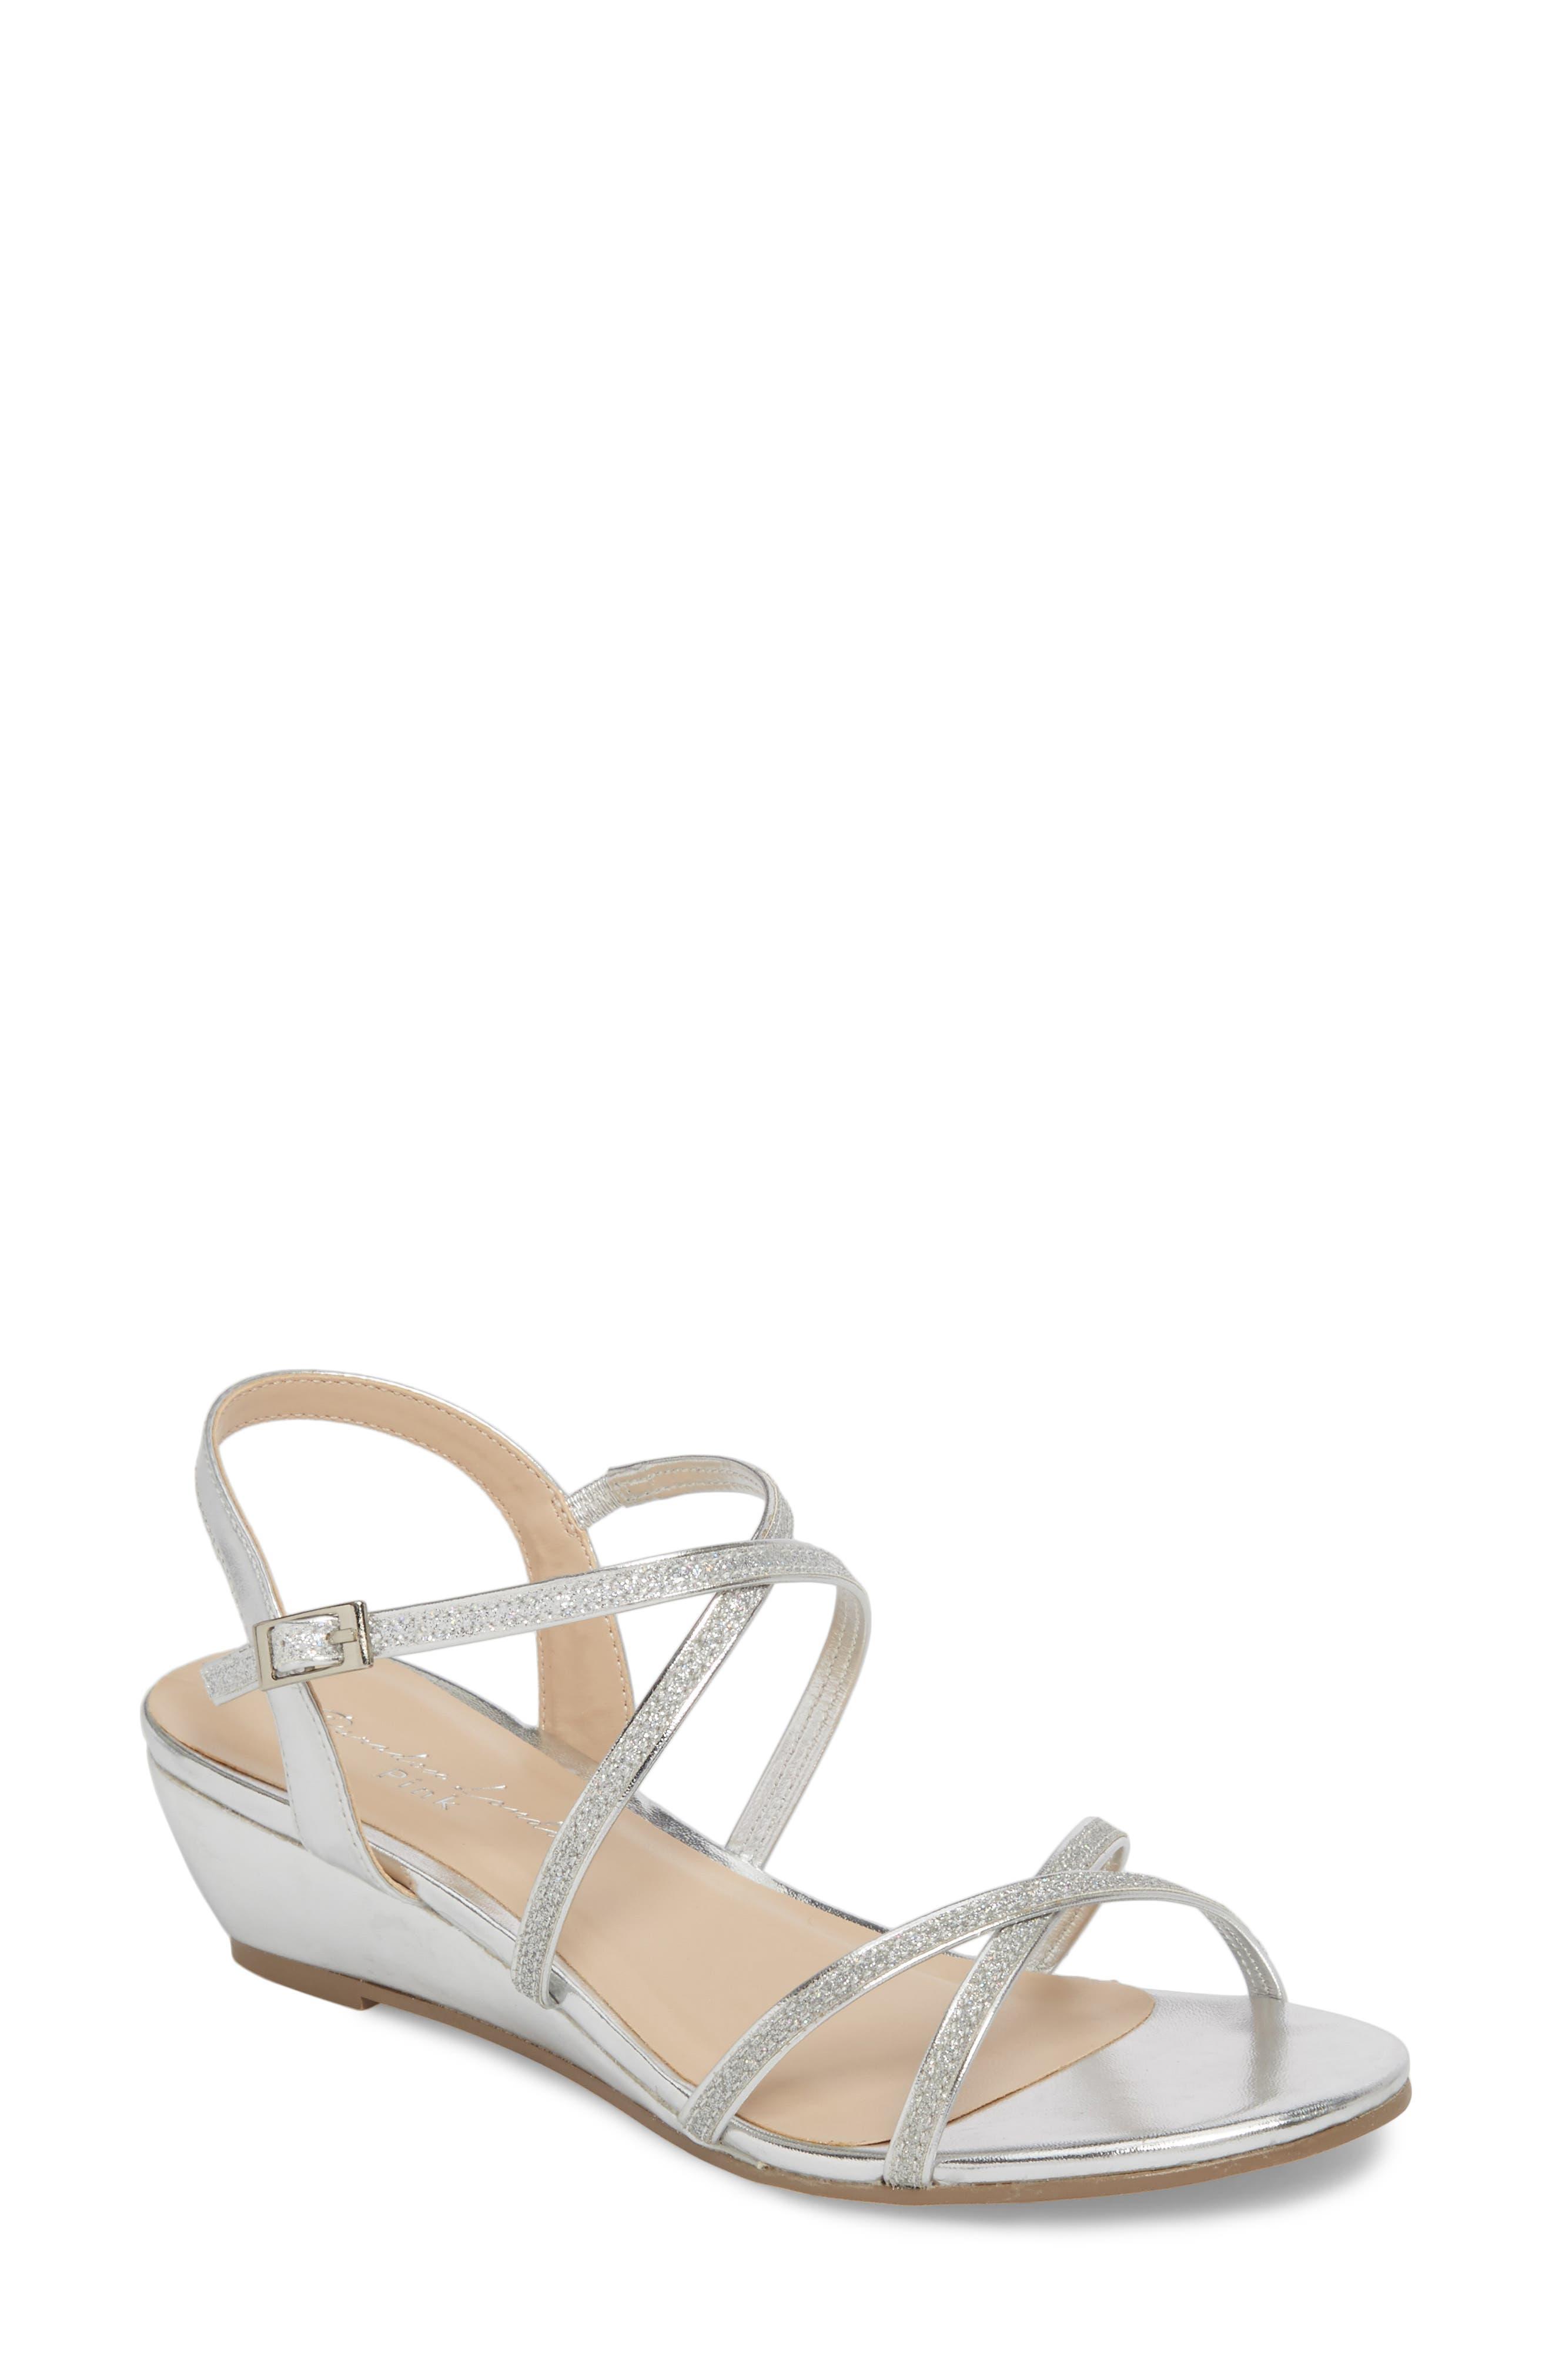 Kadie Wedge Sandal,                         Main,                         color, Silver Glitter